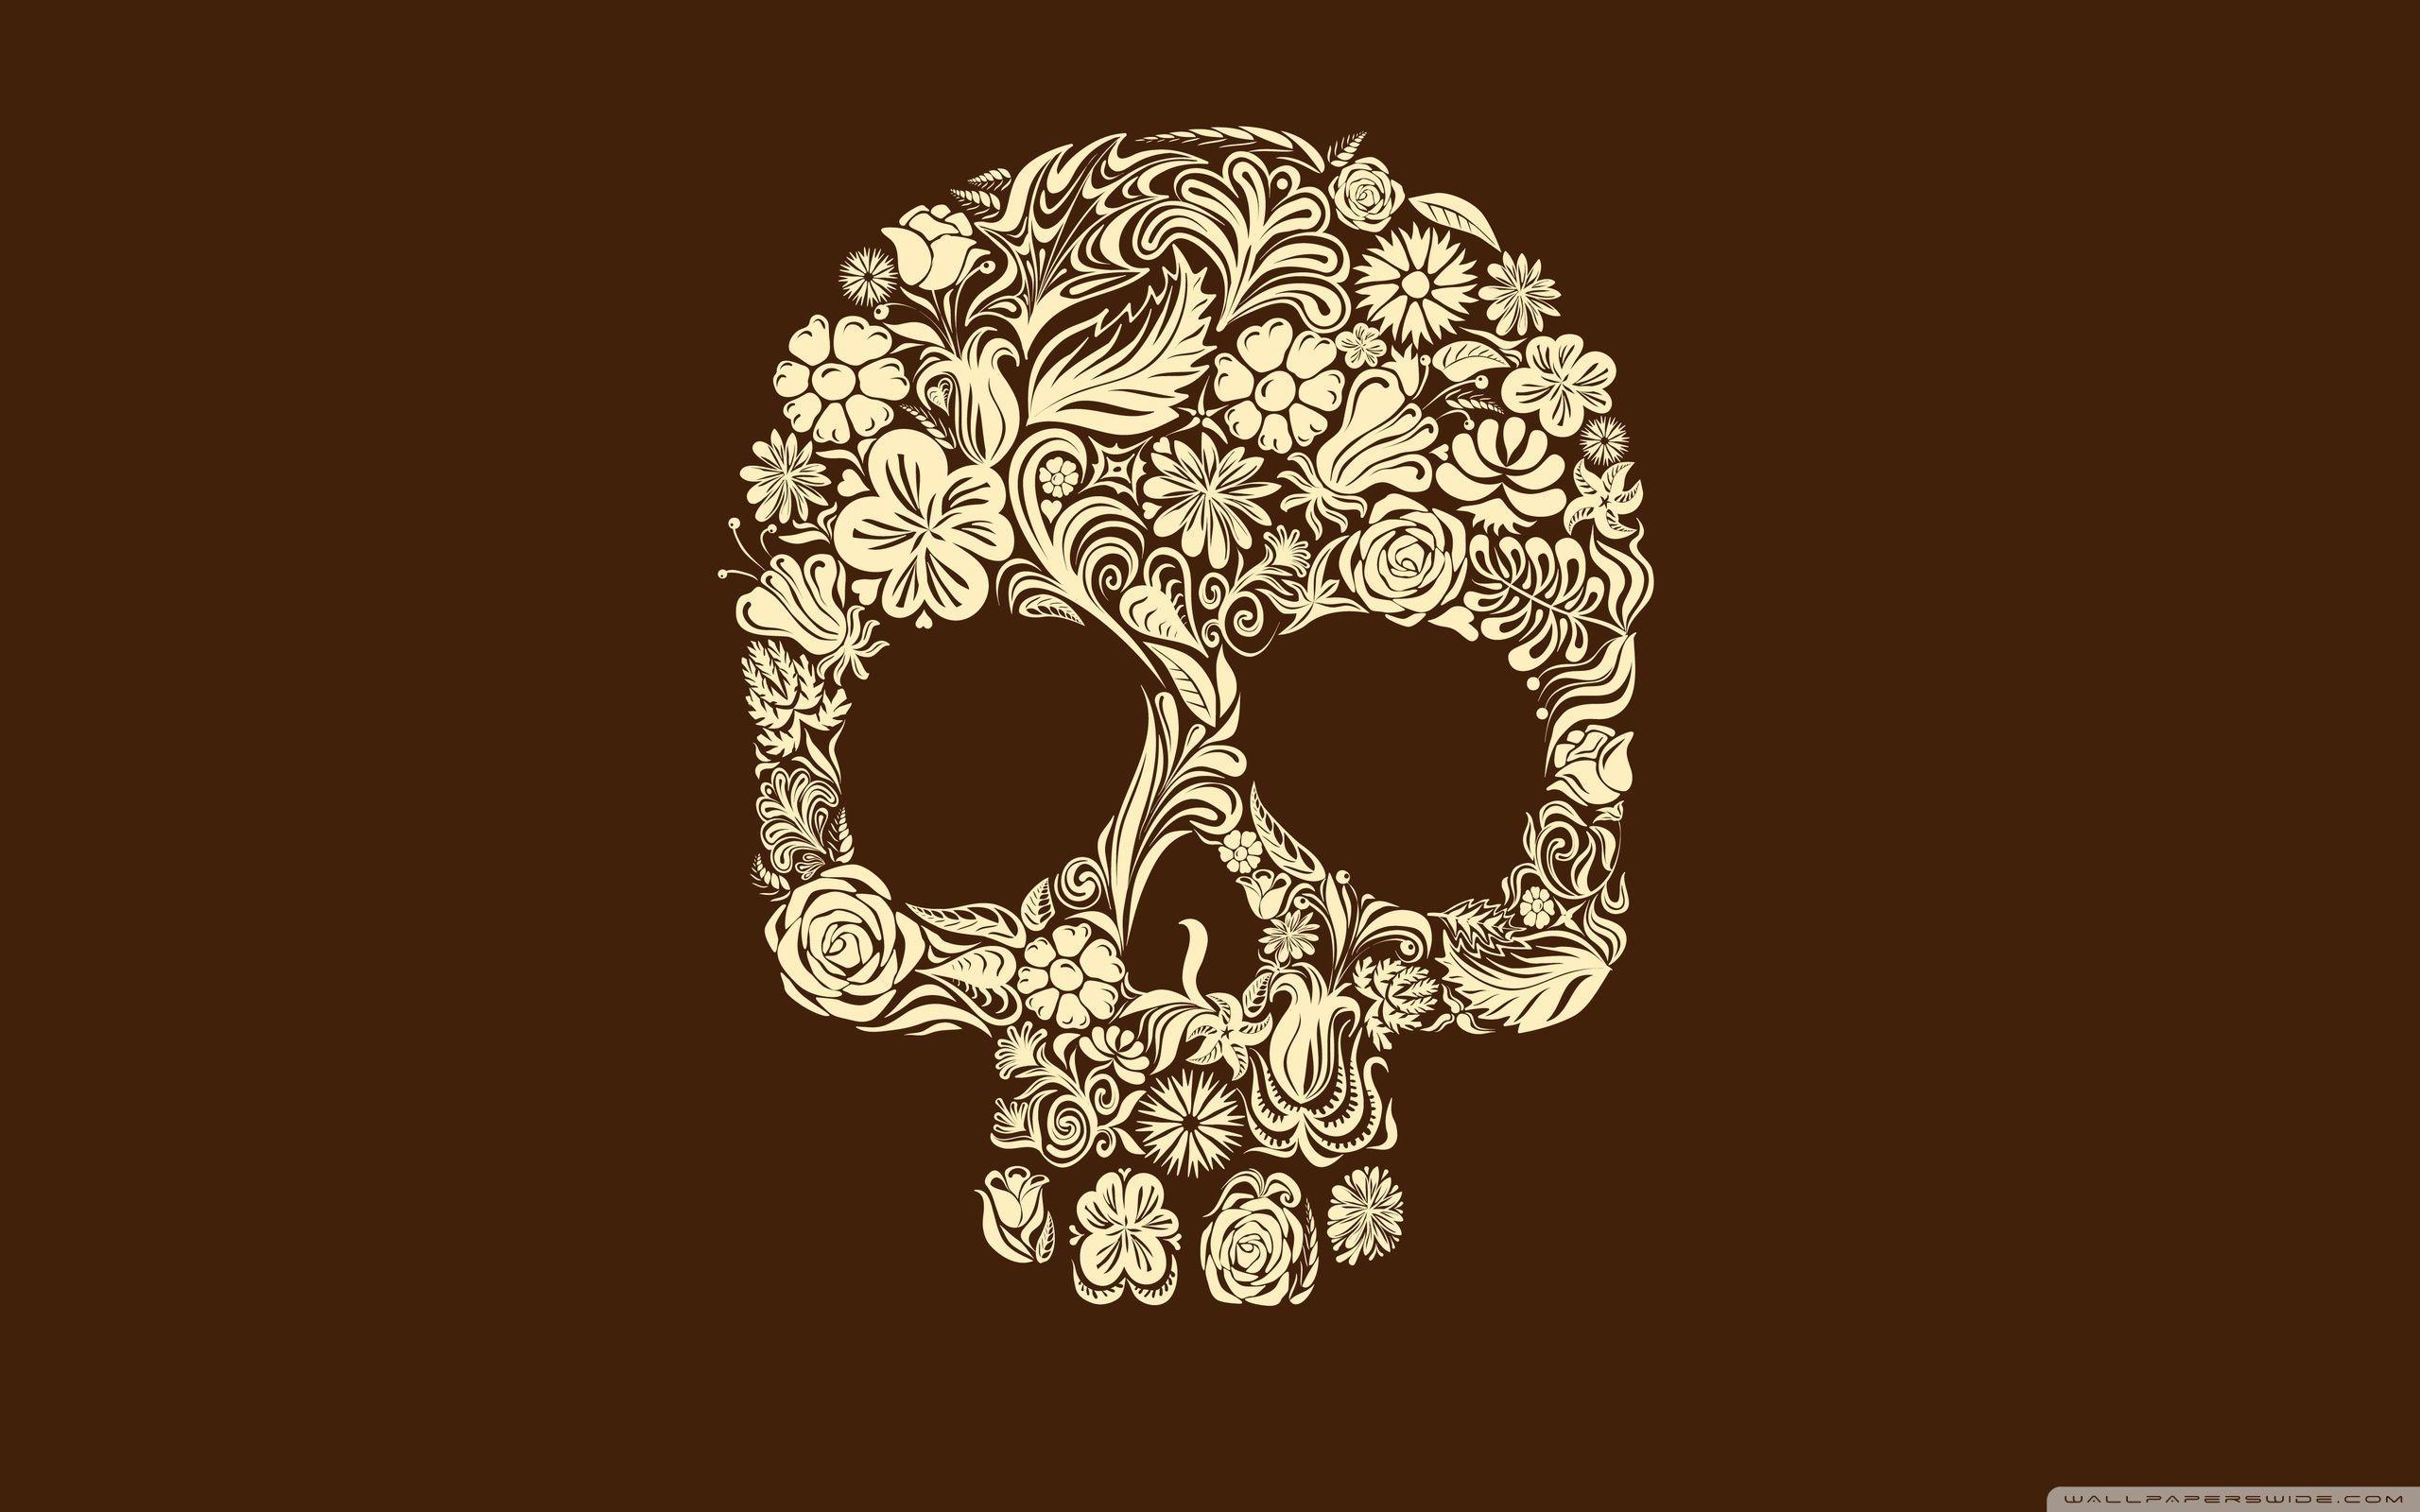 Skull Art Desktop Wallpapers Top Free Skull Art Desktop Backgrounds Wallpaperaccess